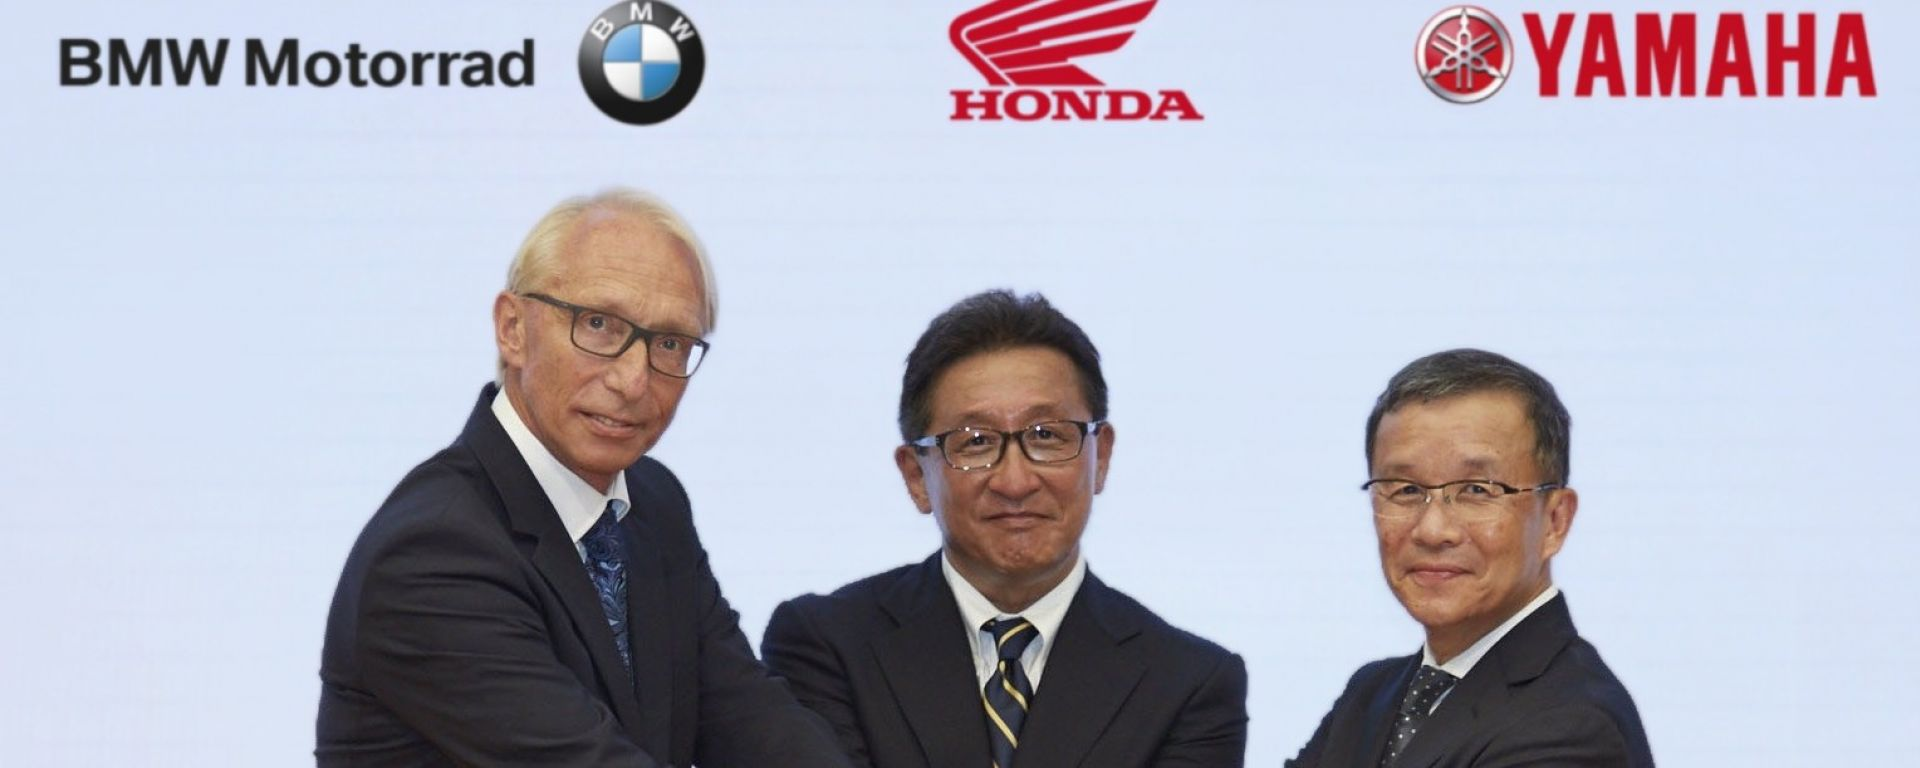 BMW, Honda e Yamaha insieme per moto più sicure